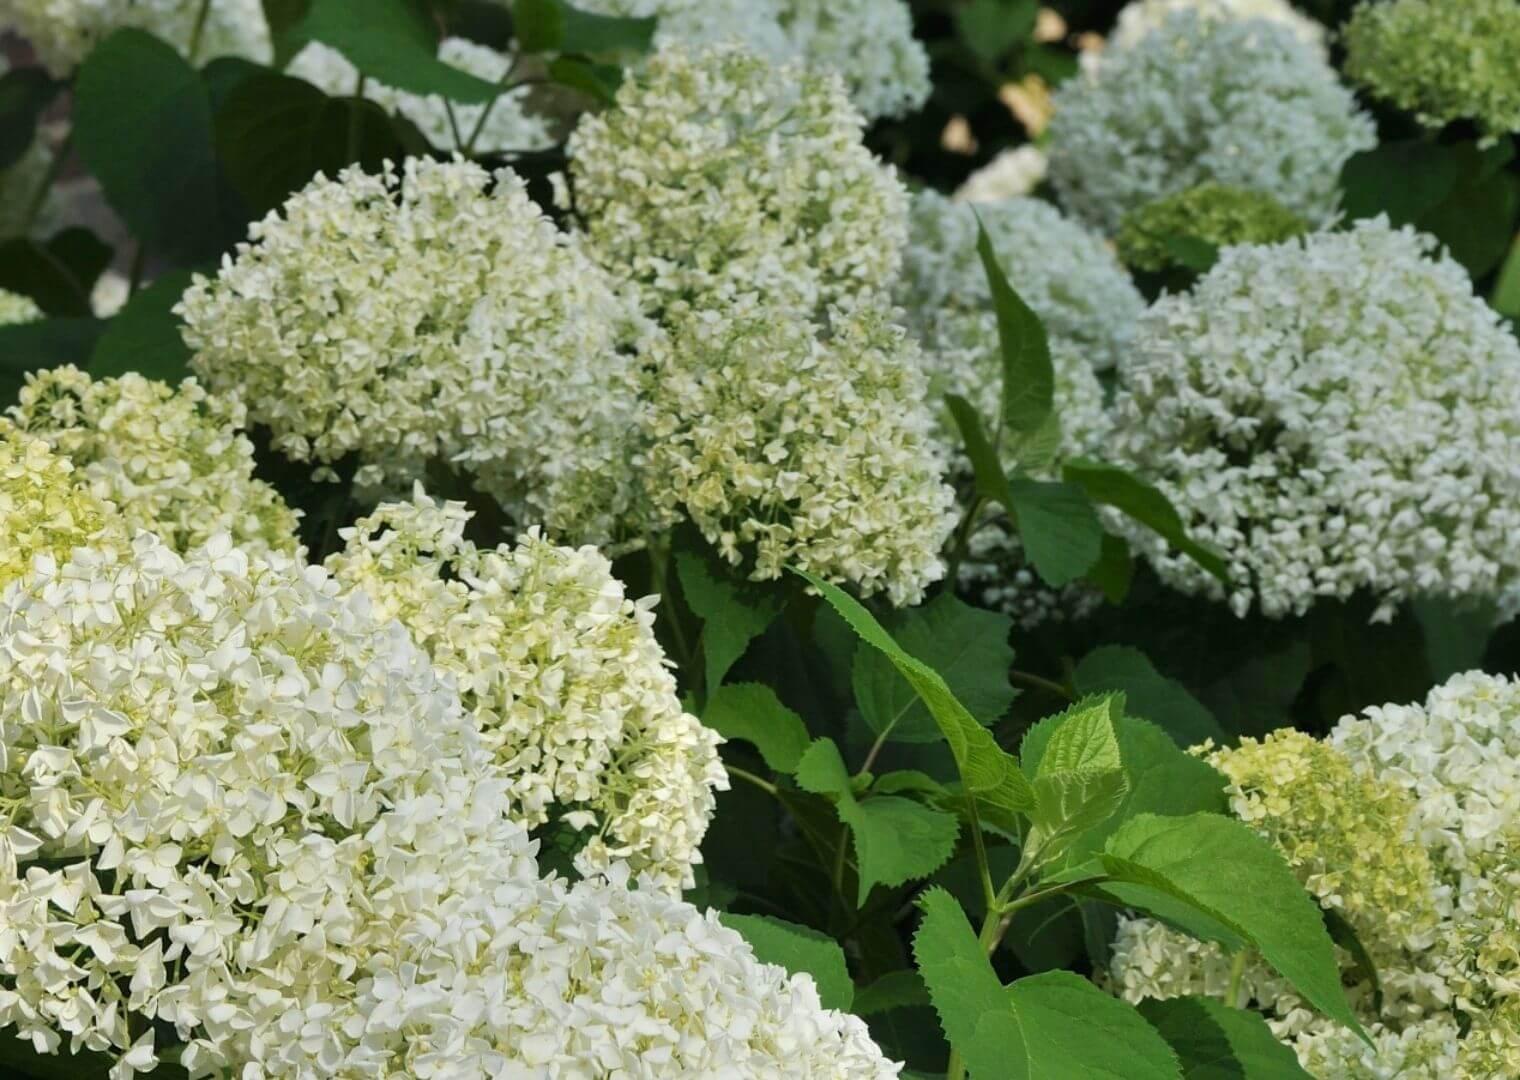 Hydrangea 'Annabelle' is good plant for a modern low-maintenance garden